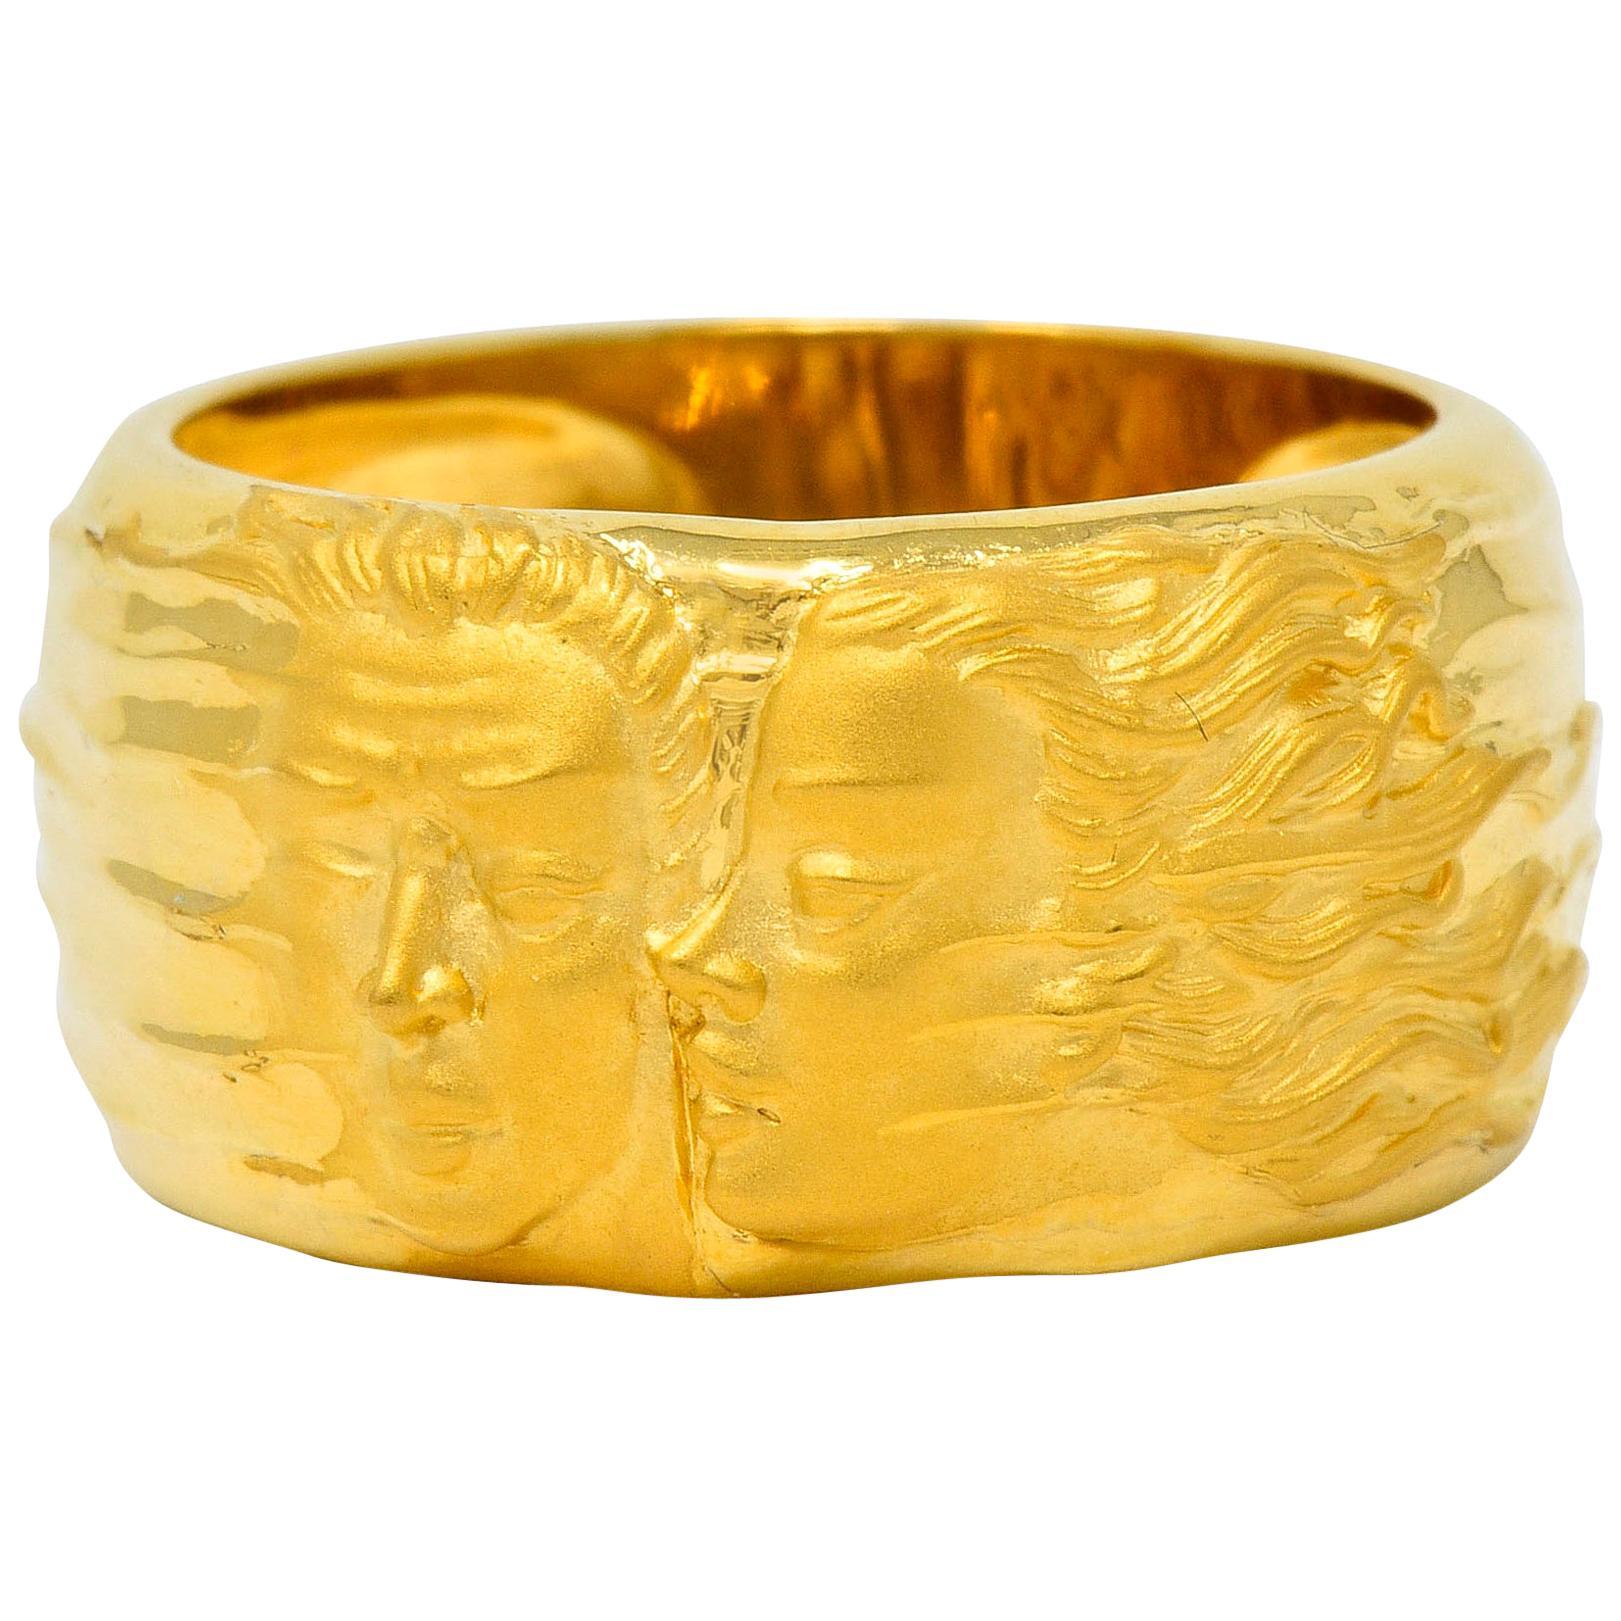 Carrera y Carrera 18 Karat Yellow Gold Adam and Eve Band Ring, circa 1990